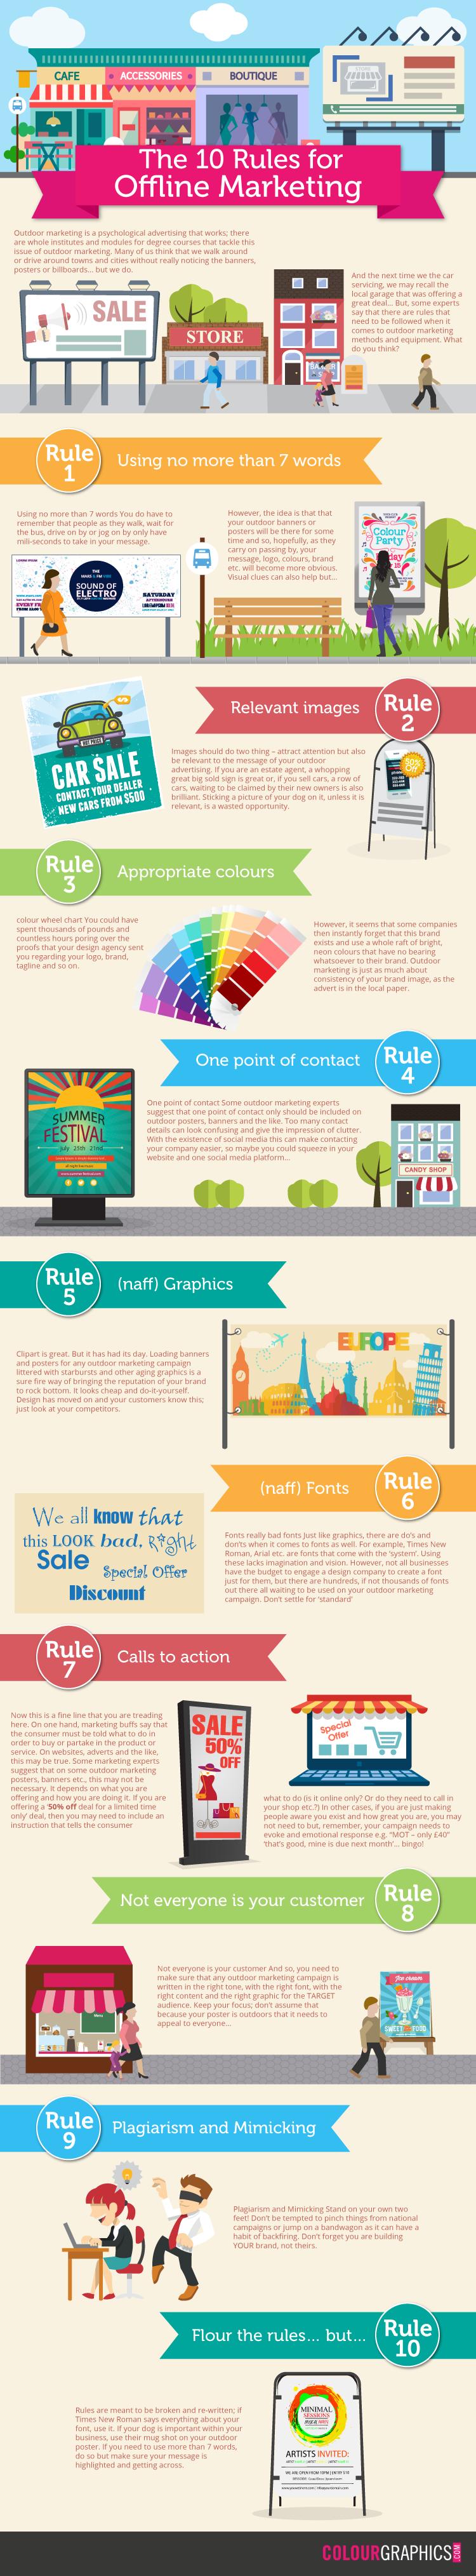 10 rules of offline marketing